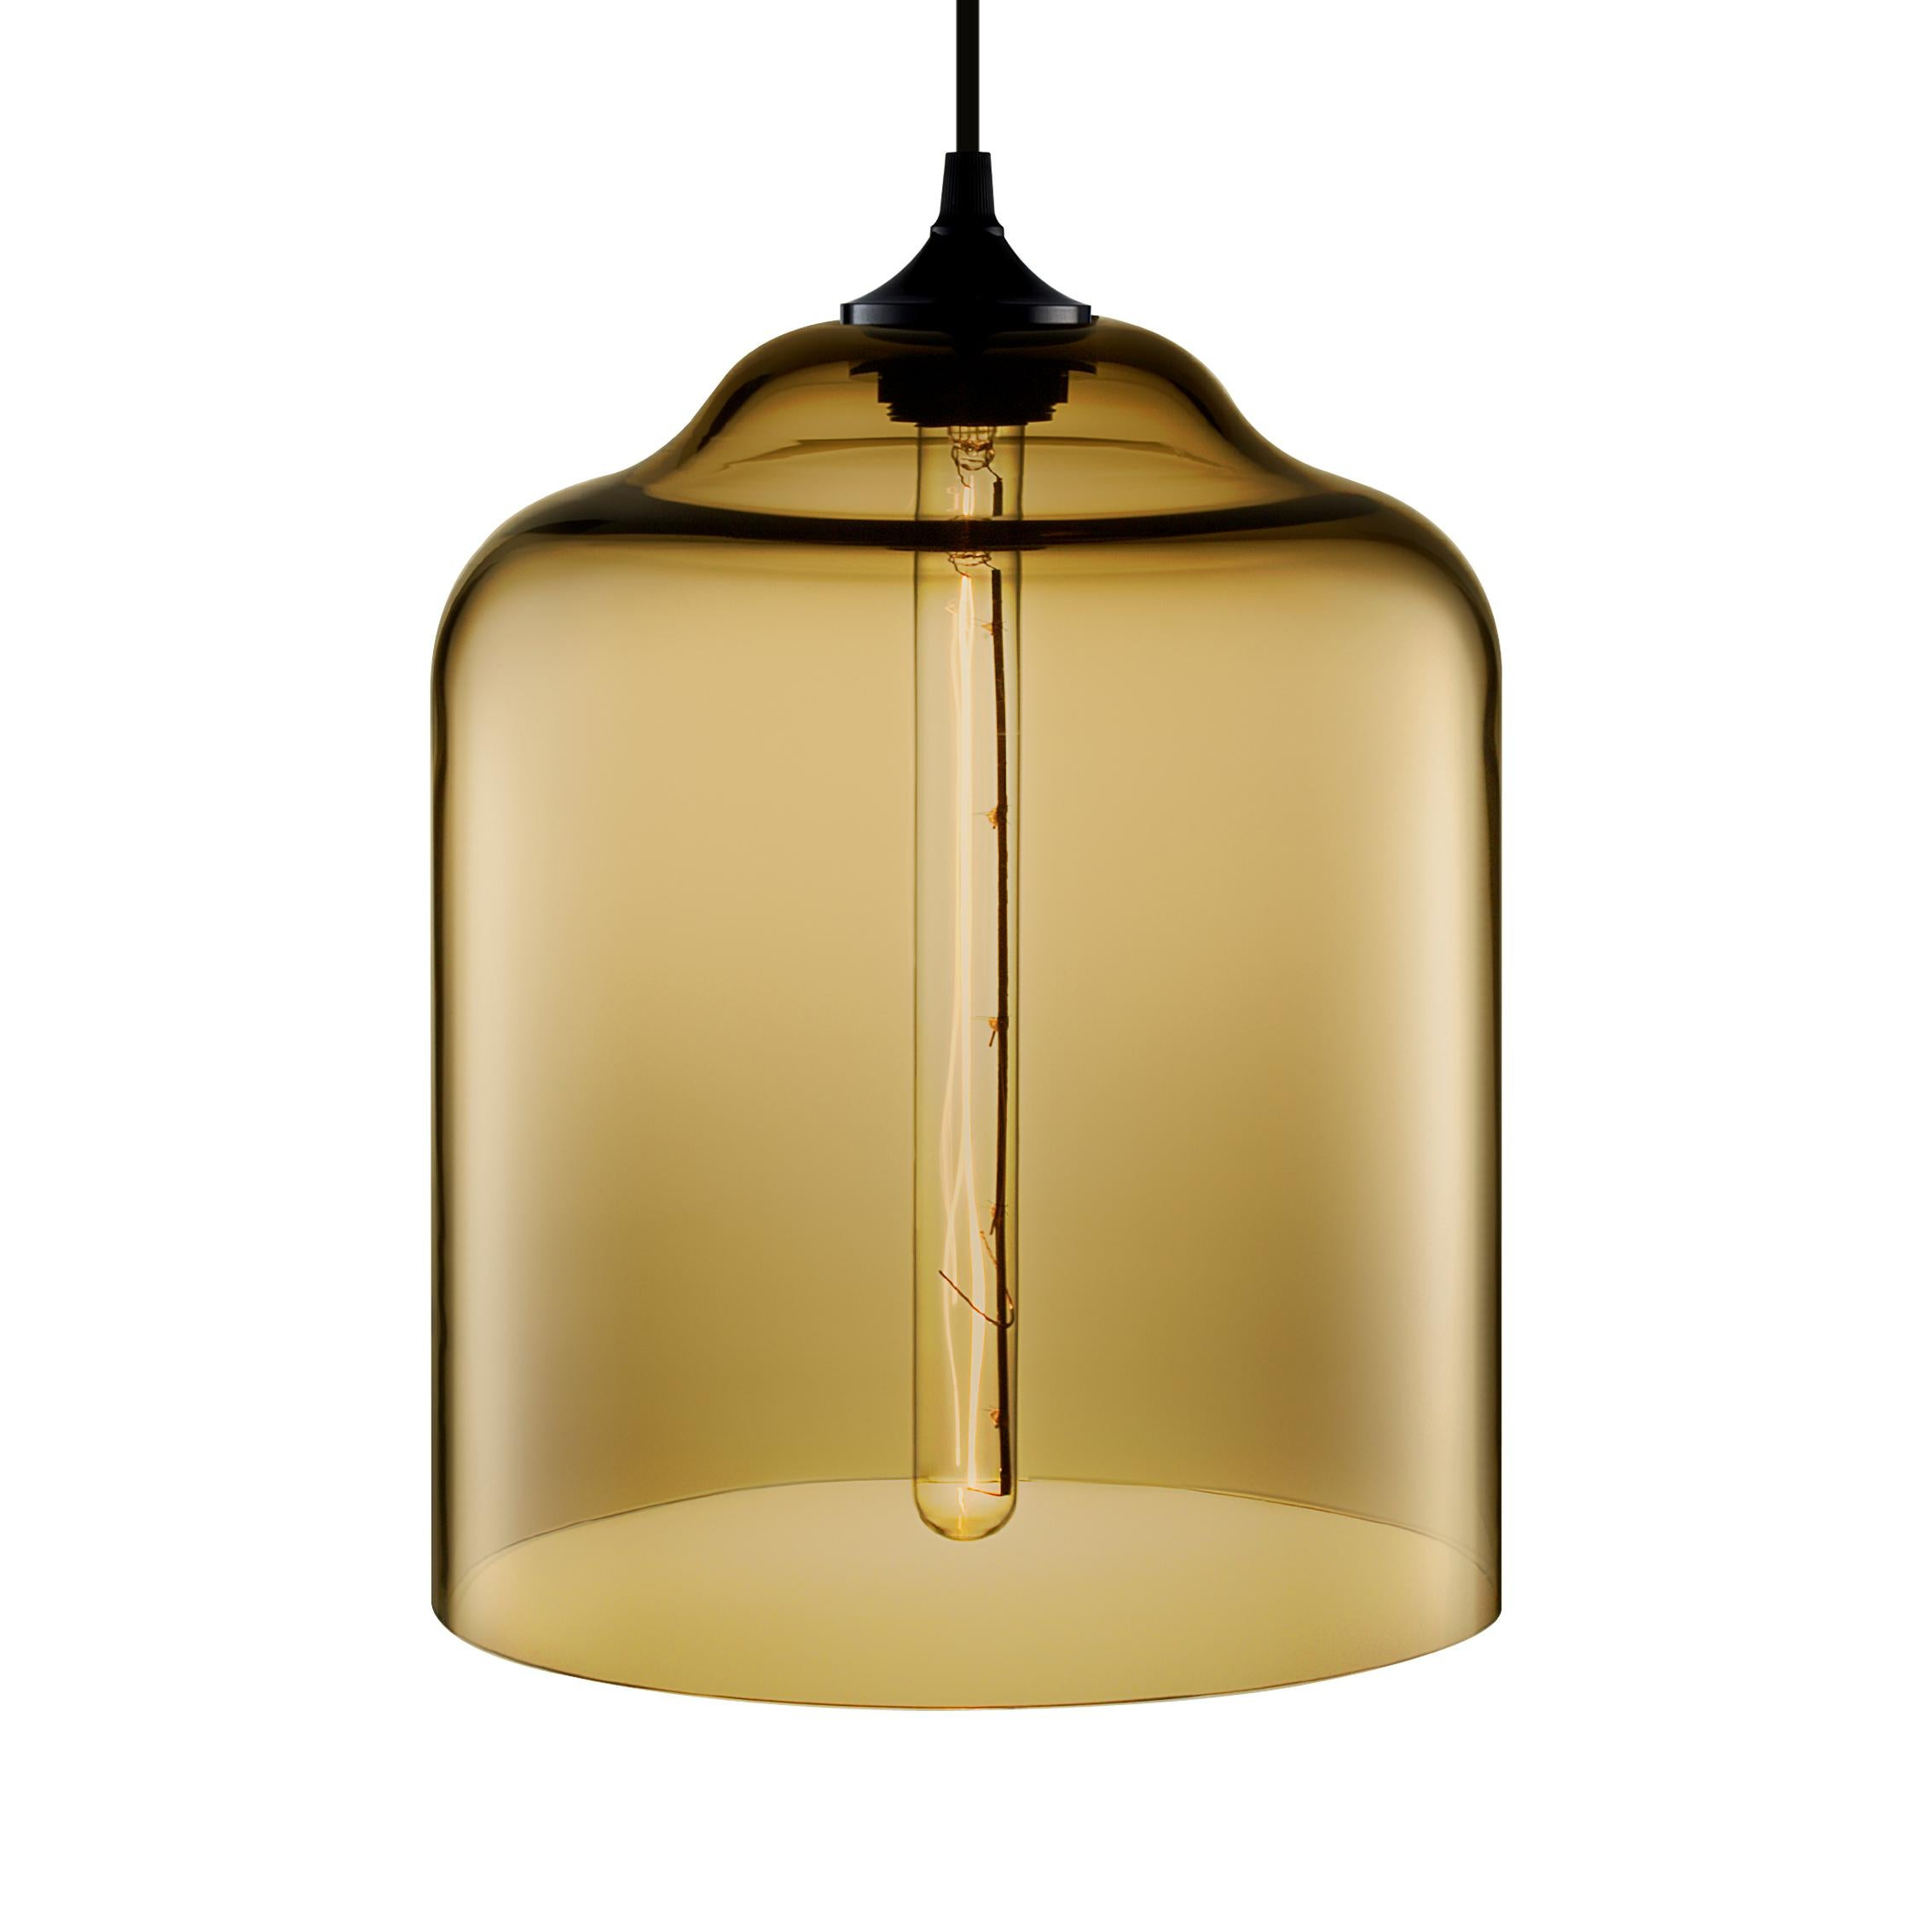 Bell Jar Sapphire Handblown Modern Glass Pendant Light Made In The Usa For Sale At 1stdibs